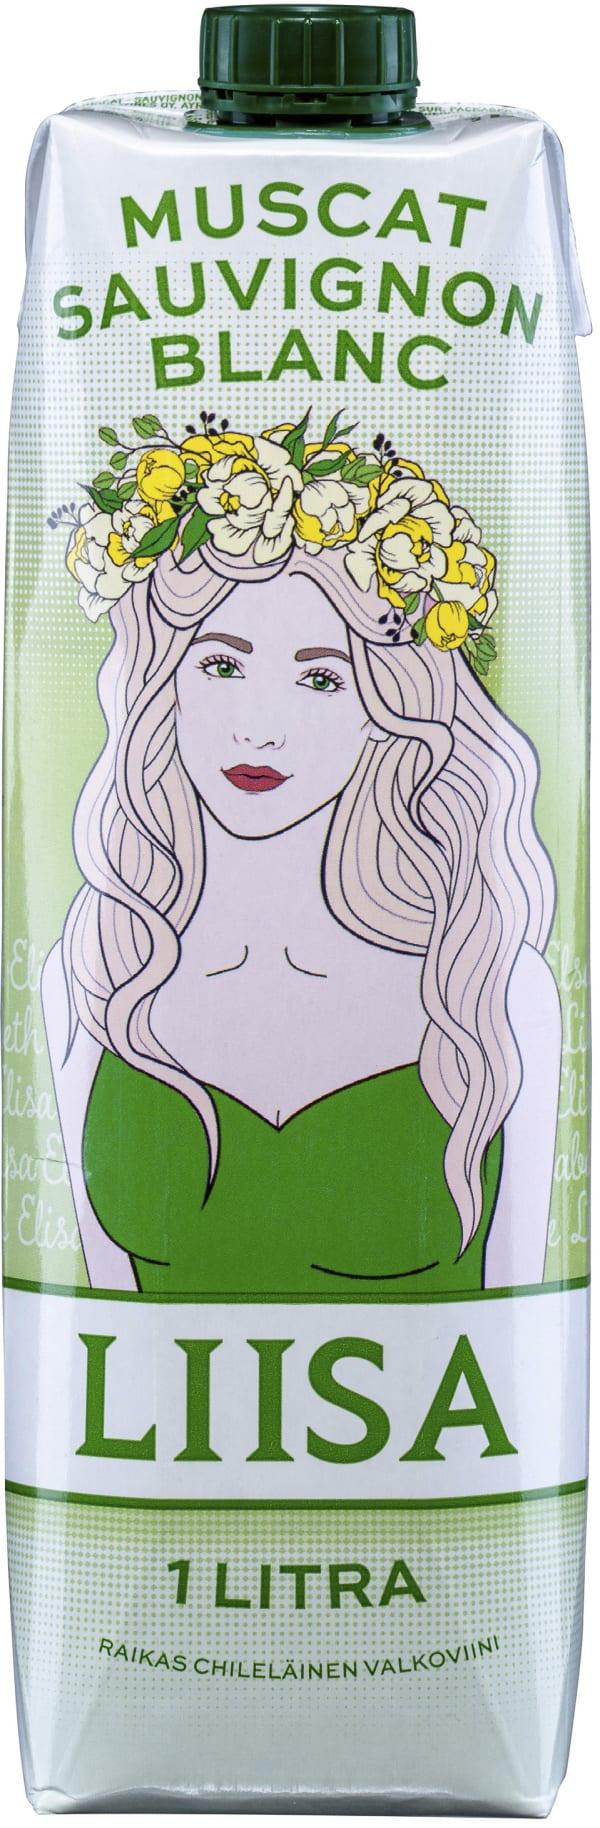 Liisa Sauvignon Blanc Muscat kartongförpackning